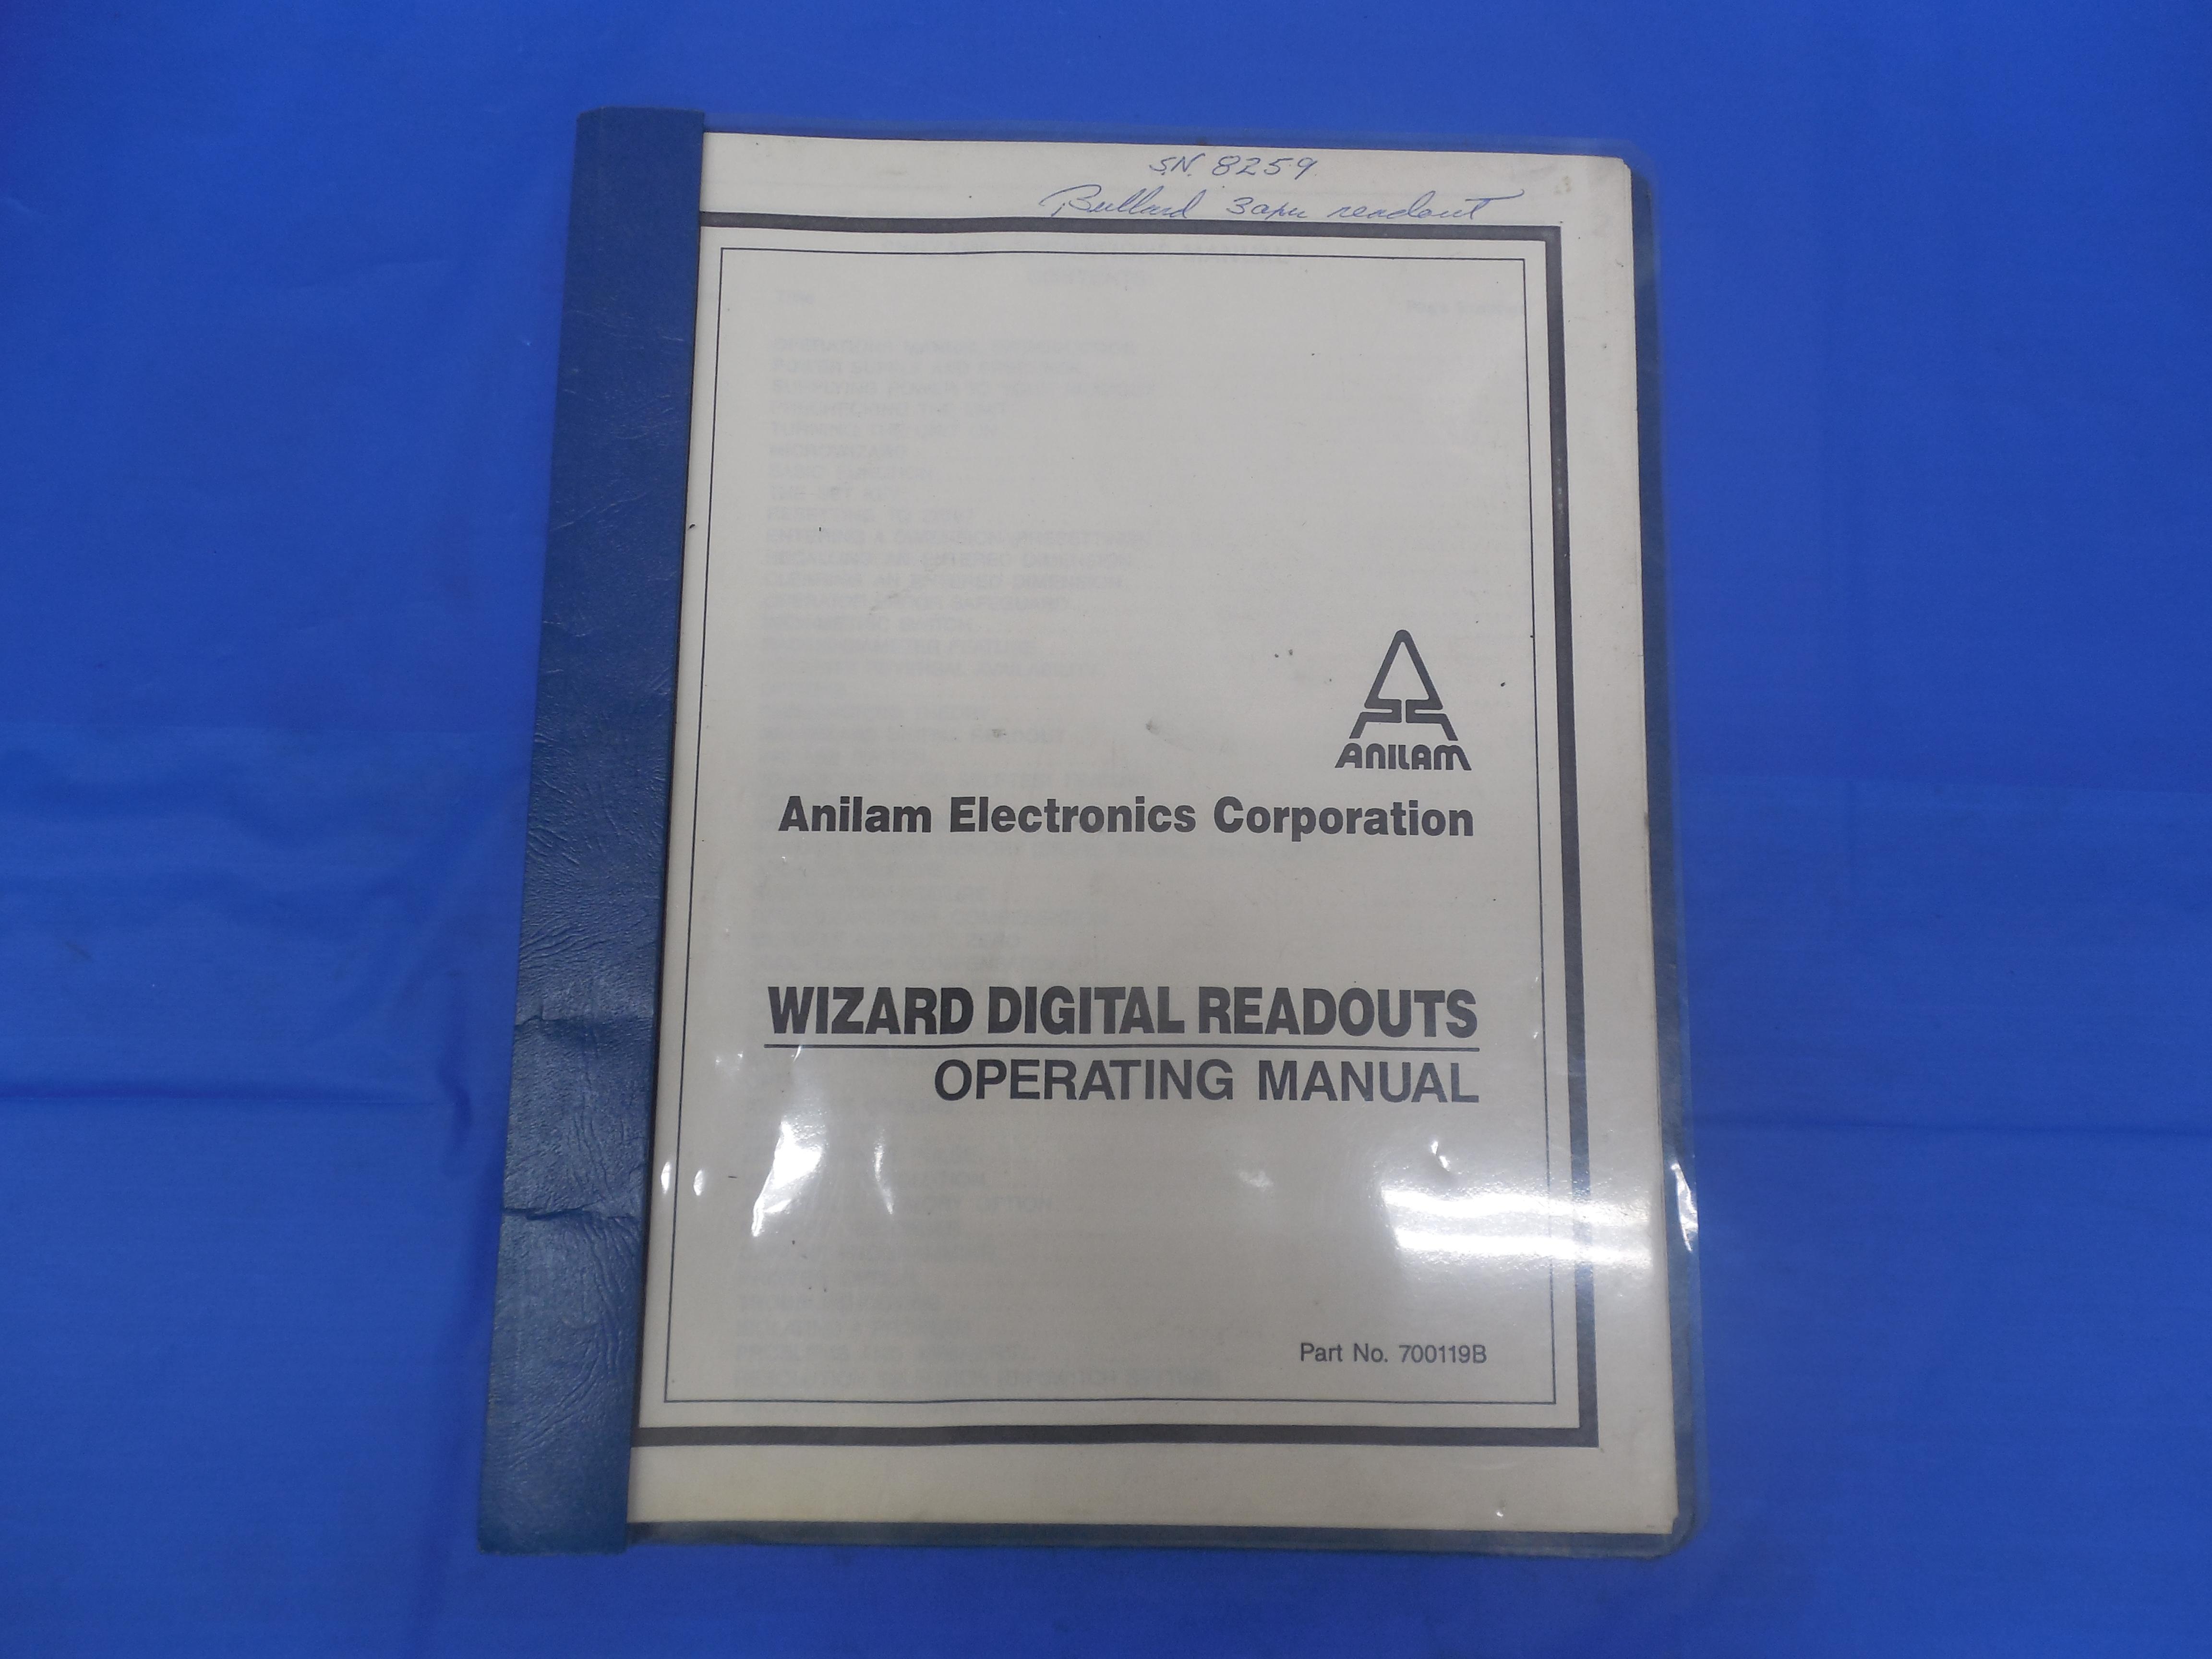 Anilam 5000M 6000 6000i CNC DNC USB FTDI Cable Hardware Flow Control CNC-HW-9F